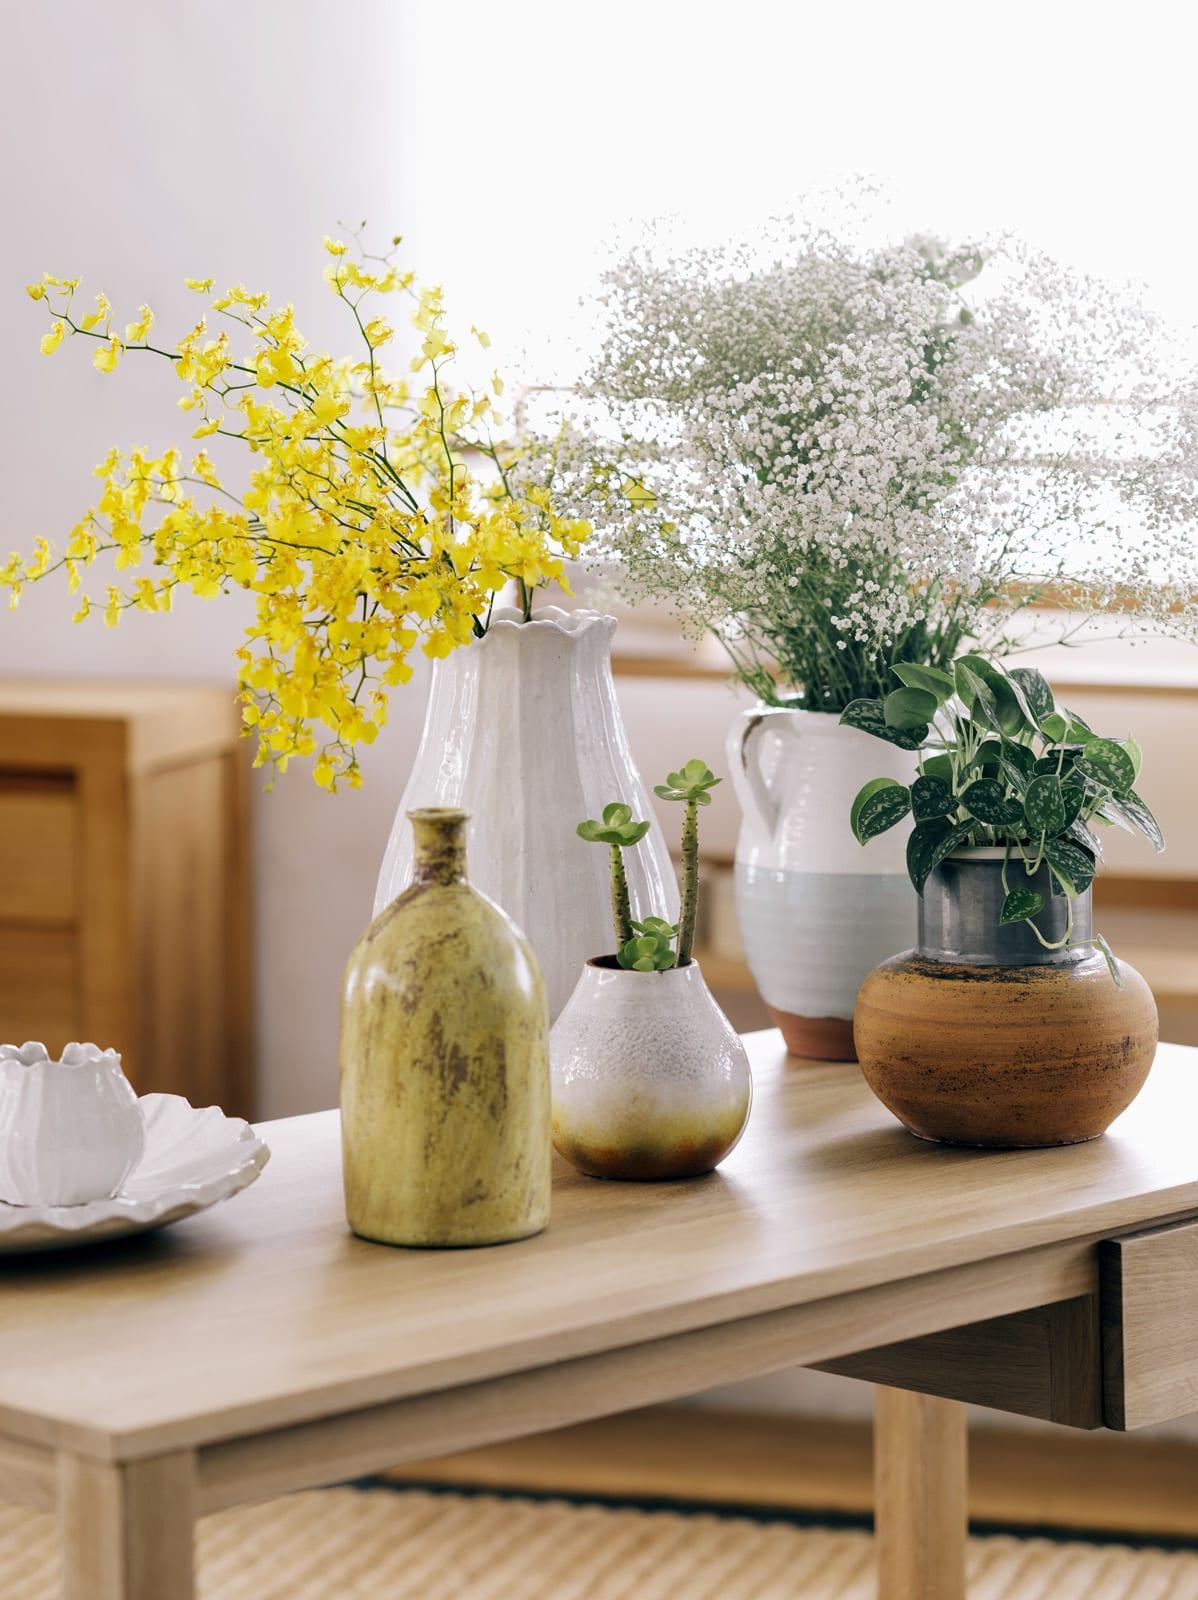 https://www.designidk.com/images/2290/tree-mar-2017-mothers-day-terracotta-ceramic-vase-varietyjpg